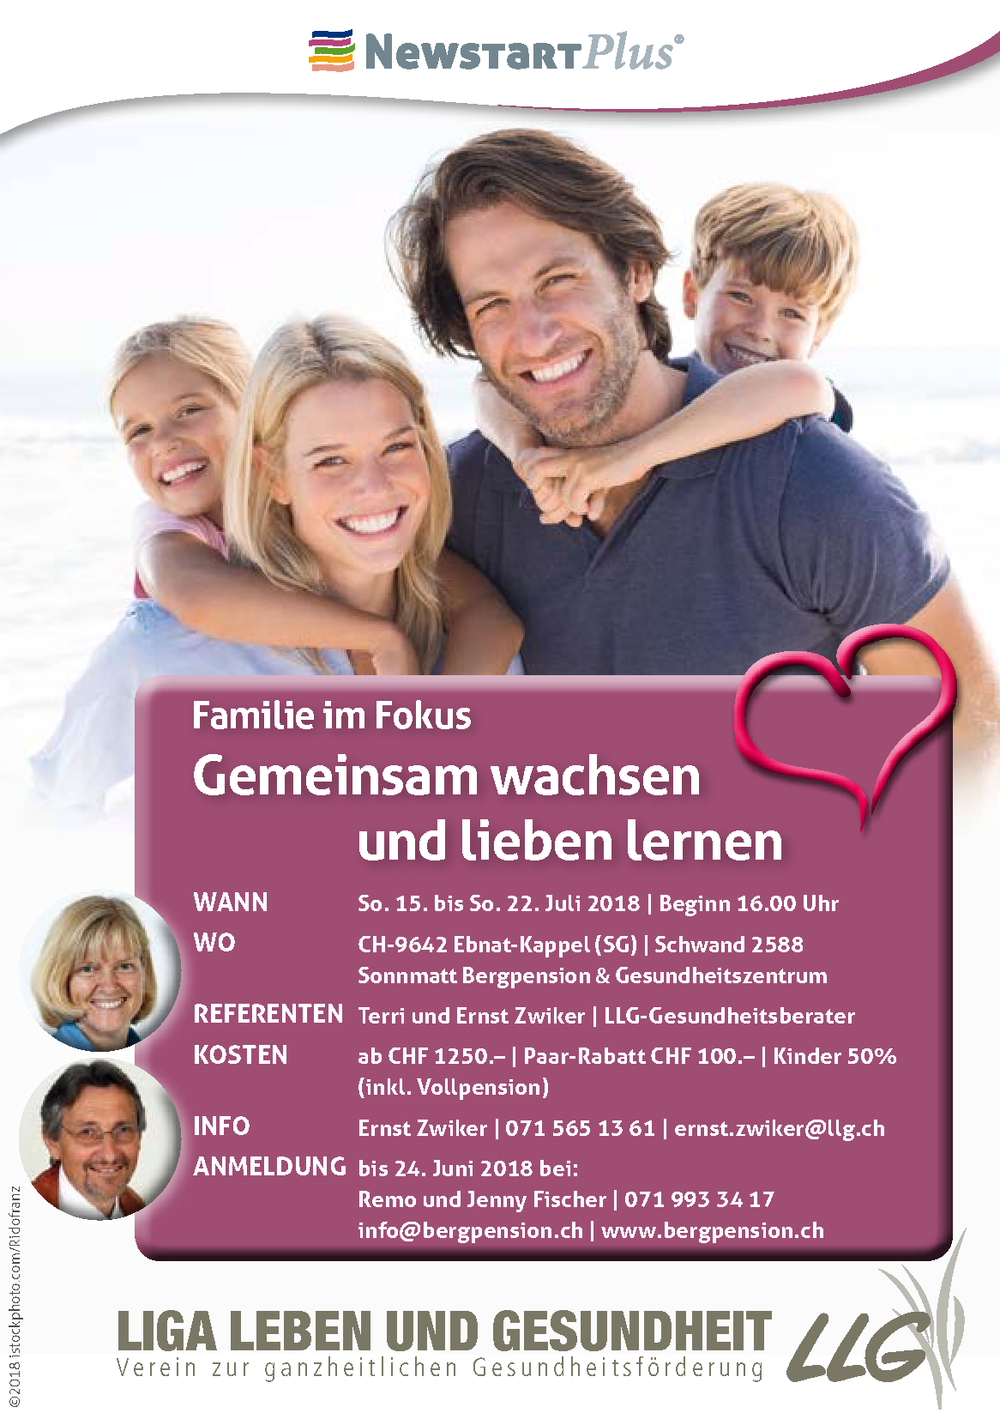 Familie_im_Fokus_w_1.png